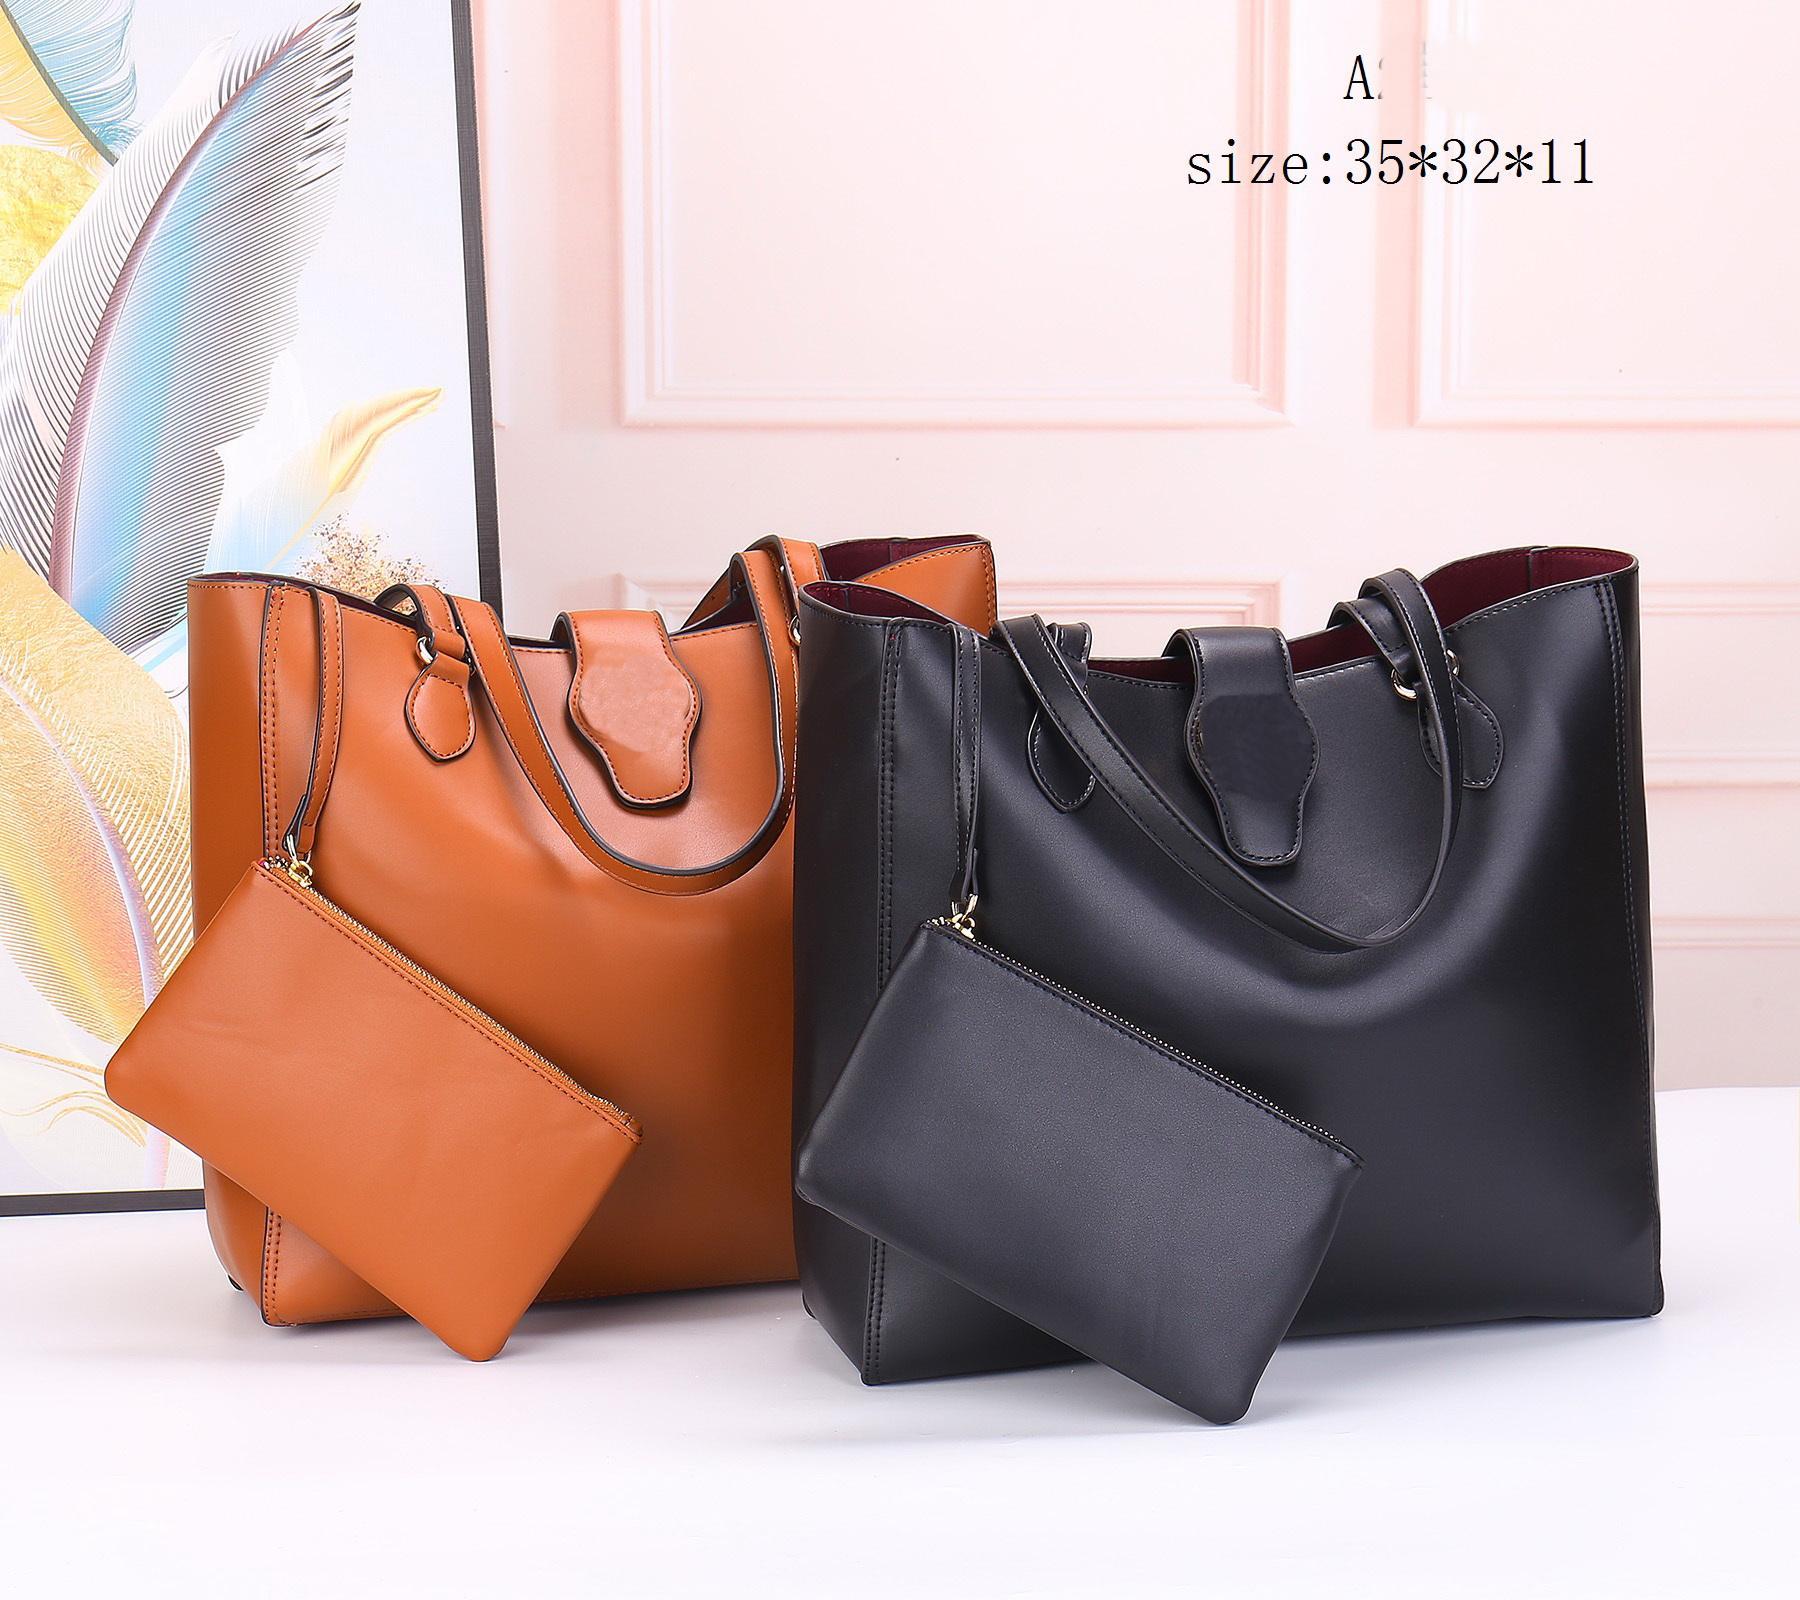 Top Quality fashion Womens black handbag bag large-capacity leather tote bags shoulder bagc handbags Chain bagv Orange bage Shopping bagsa Drawstring wallet